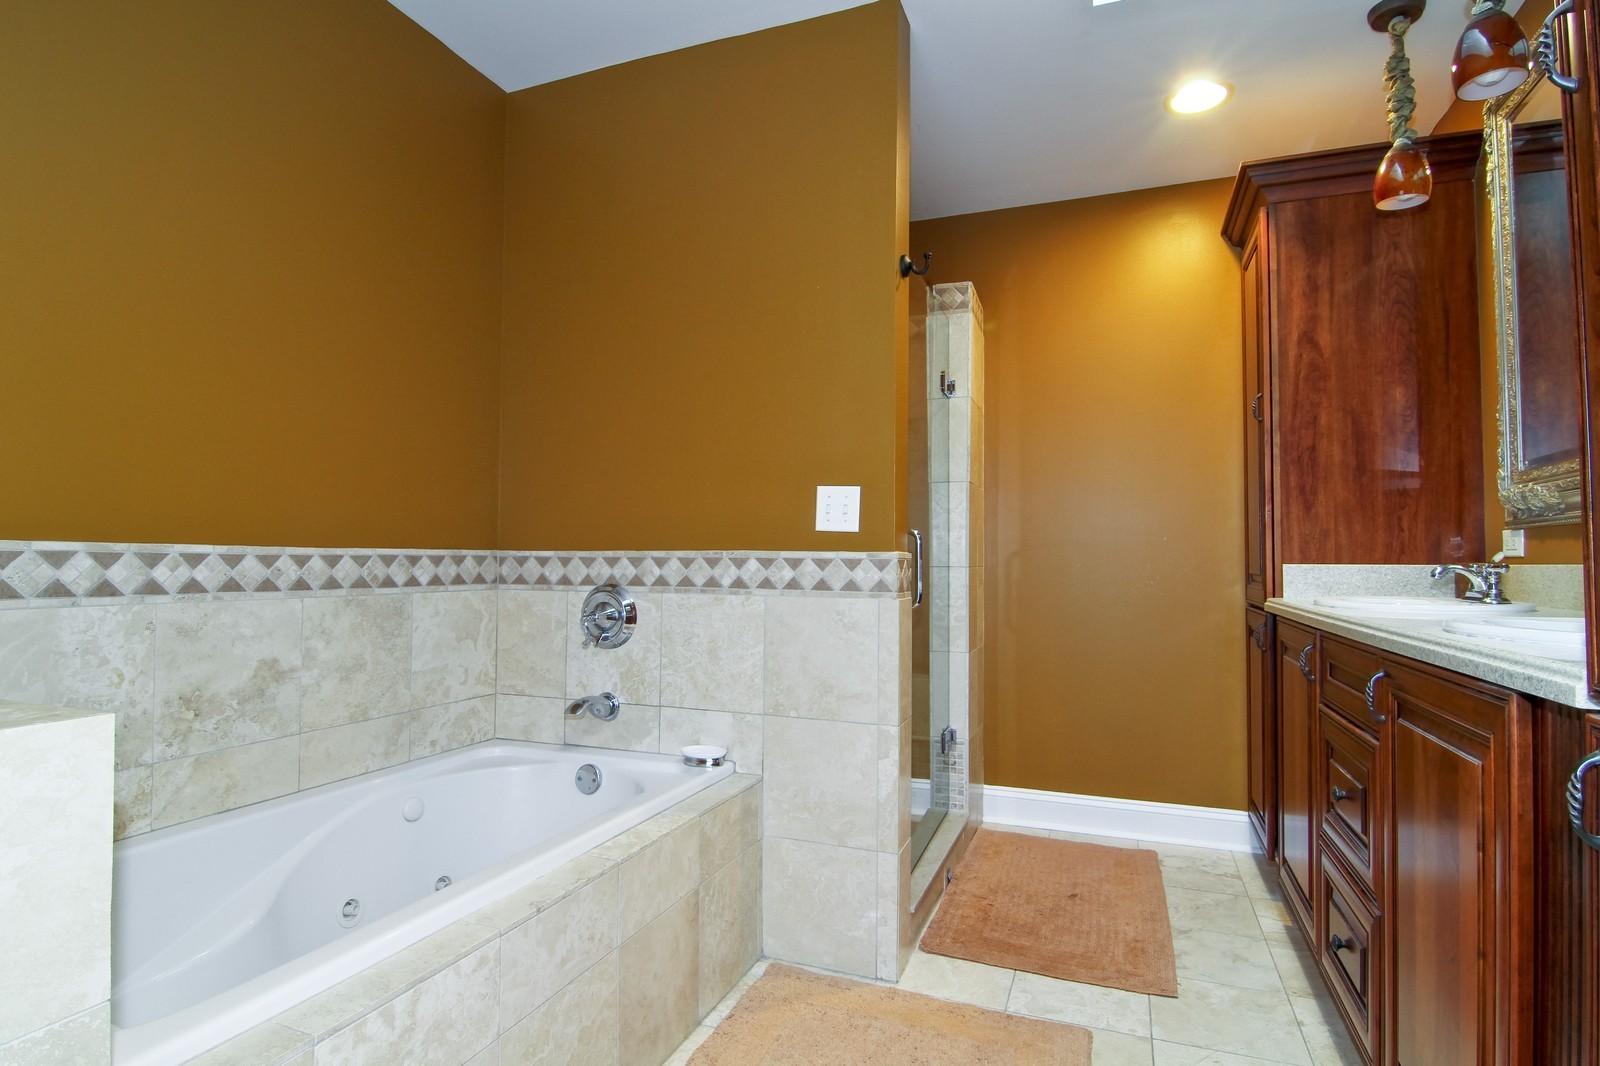 Real Estate Photography - 441 Edgewood Dr, La Grange, IL, 60525 - Master Bathroom